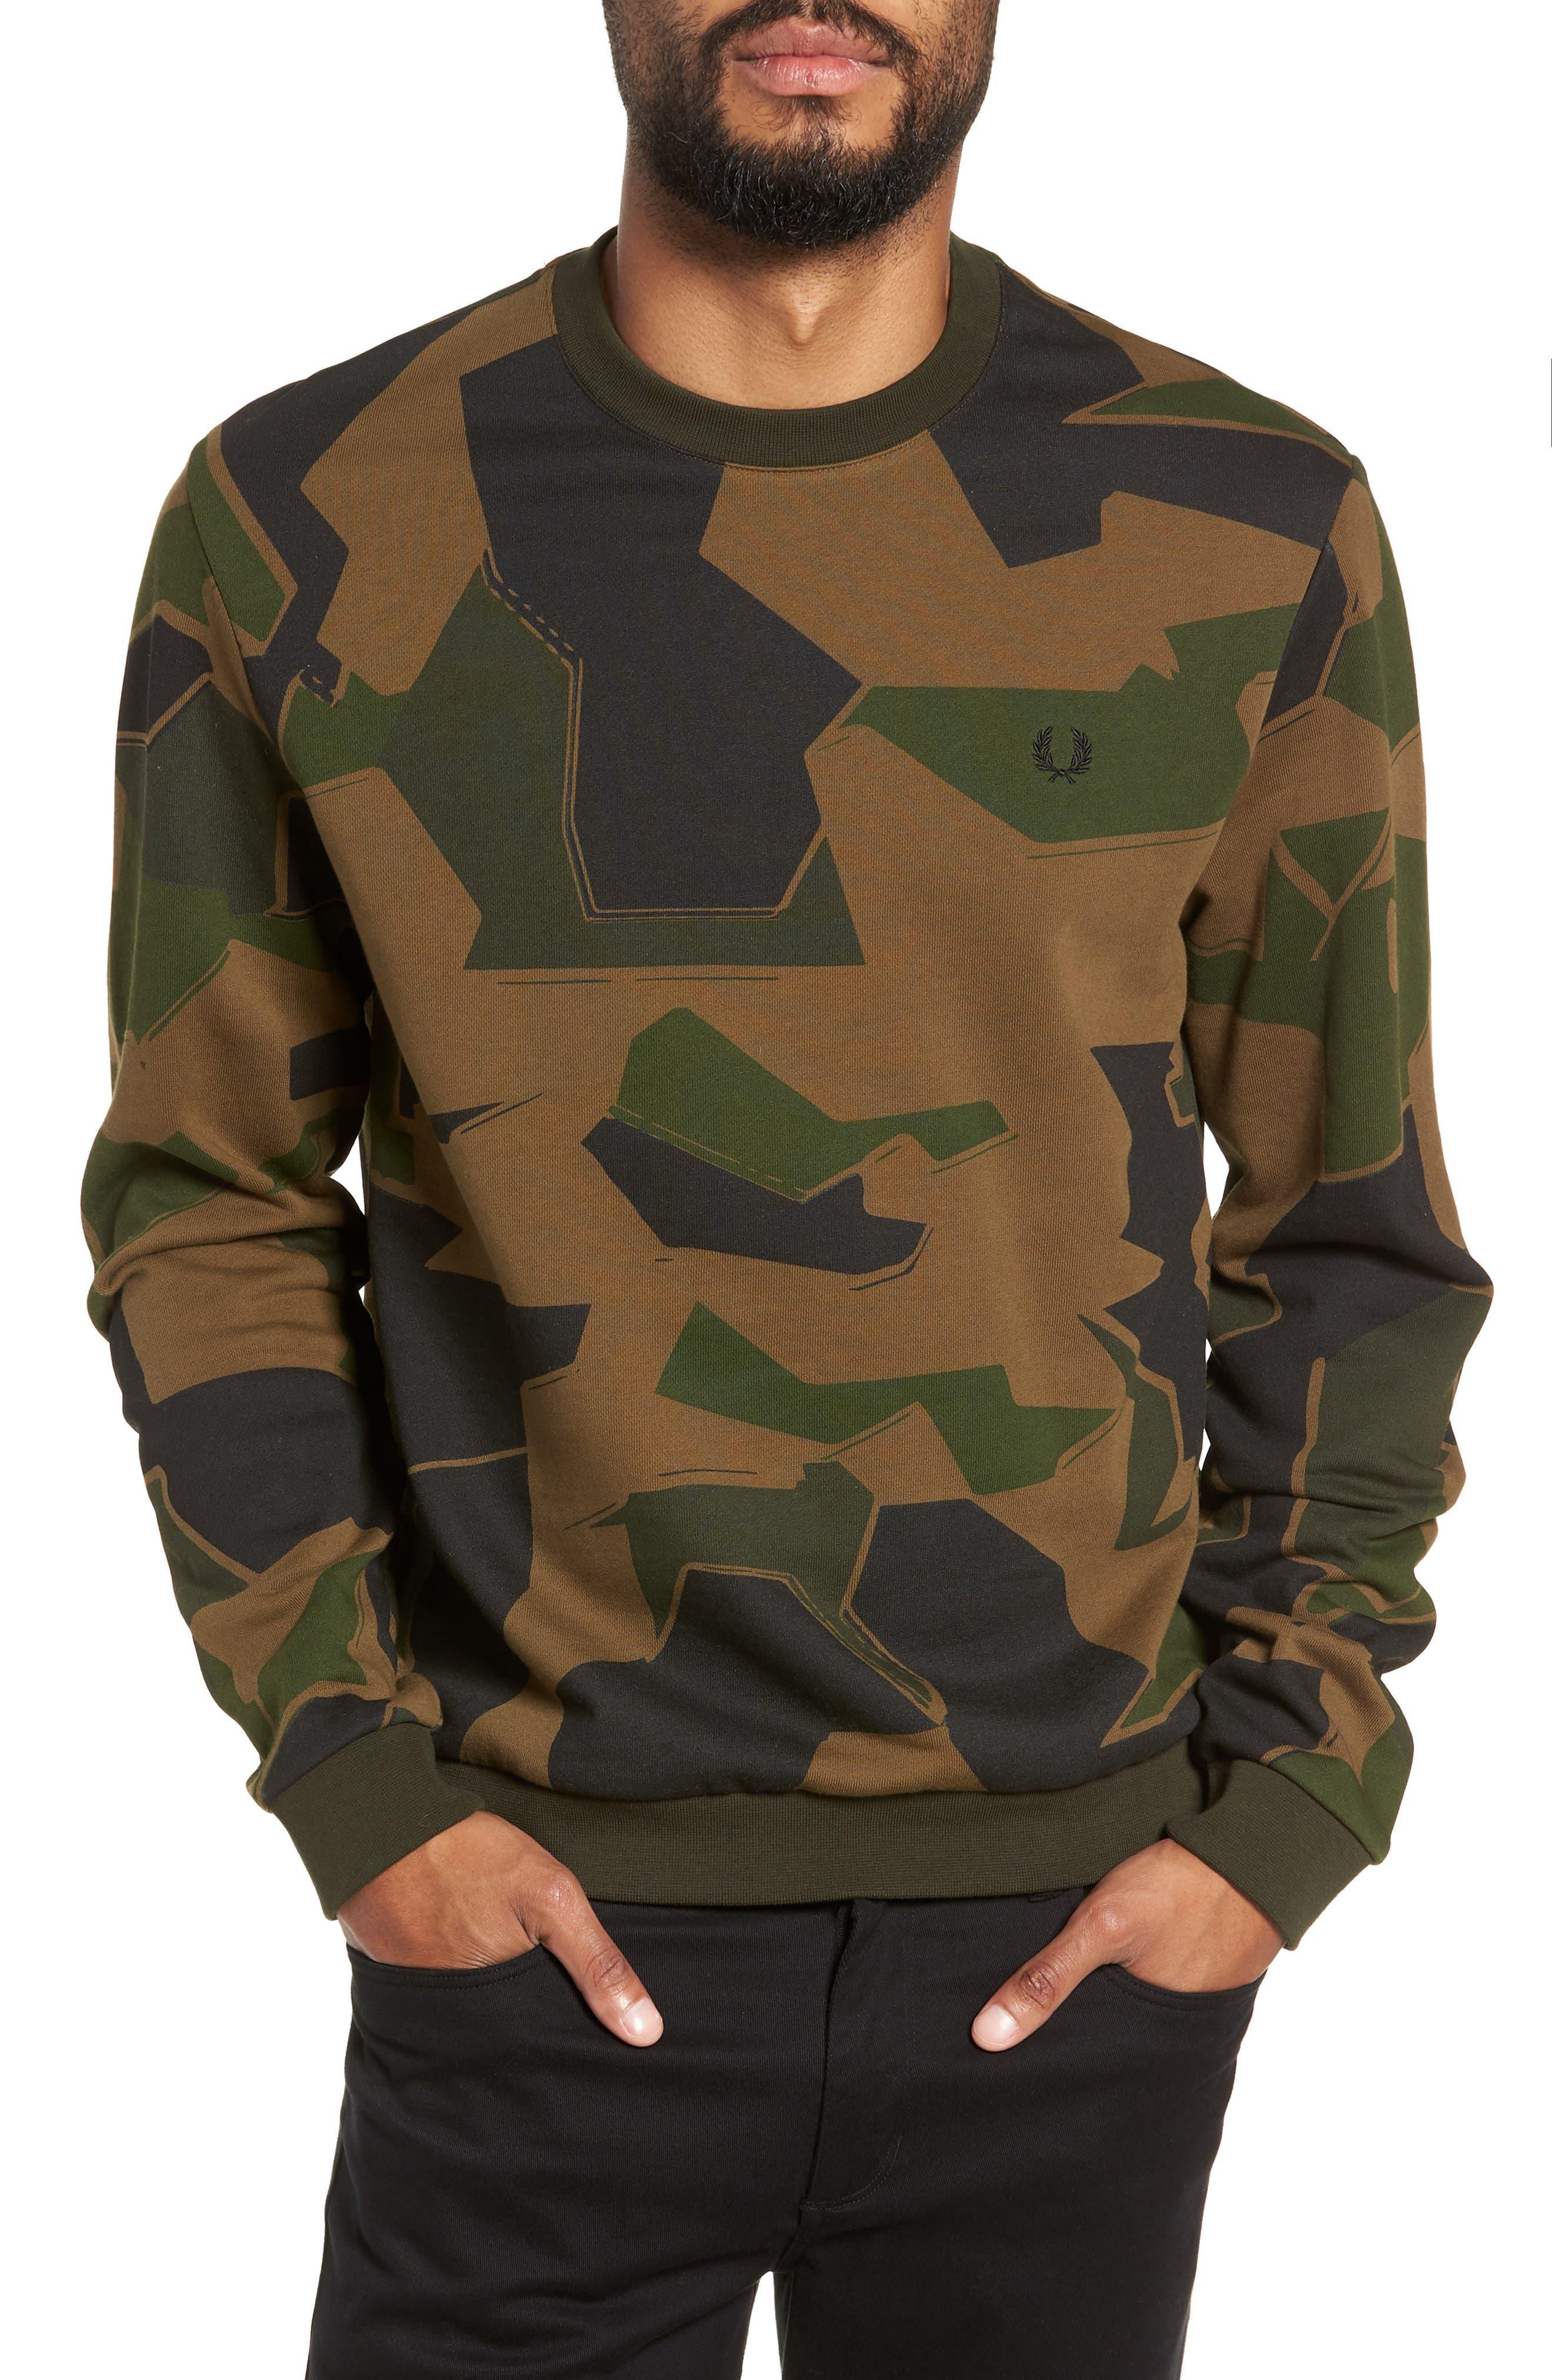 Camoflage Sweatshirt,                         Main,                         color, WOODLAND CAMO